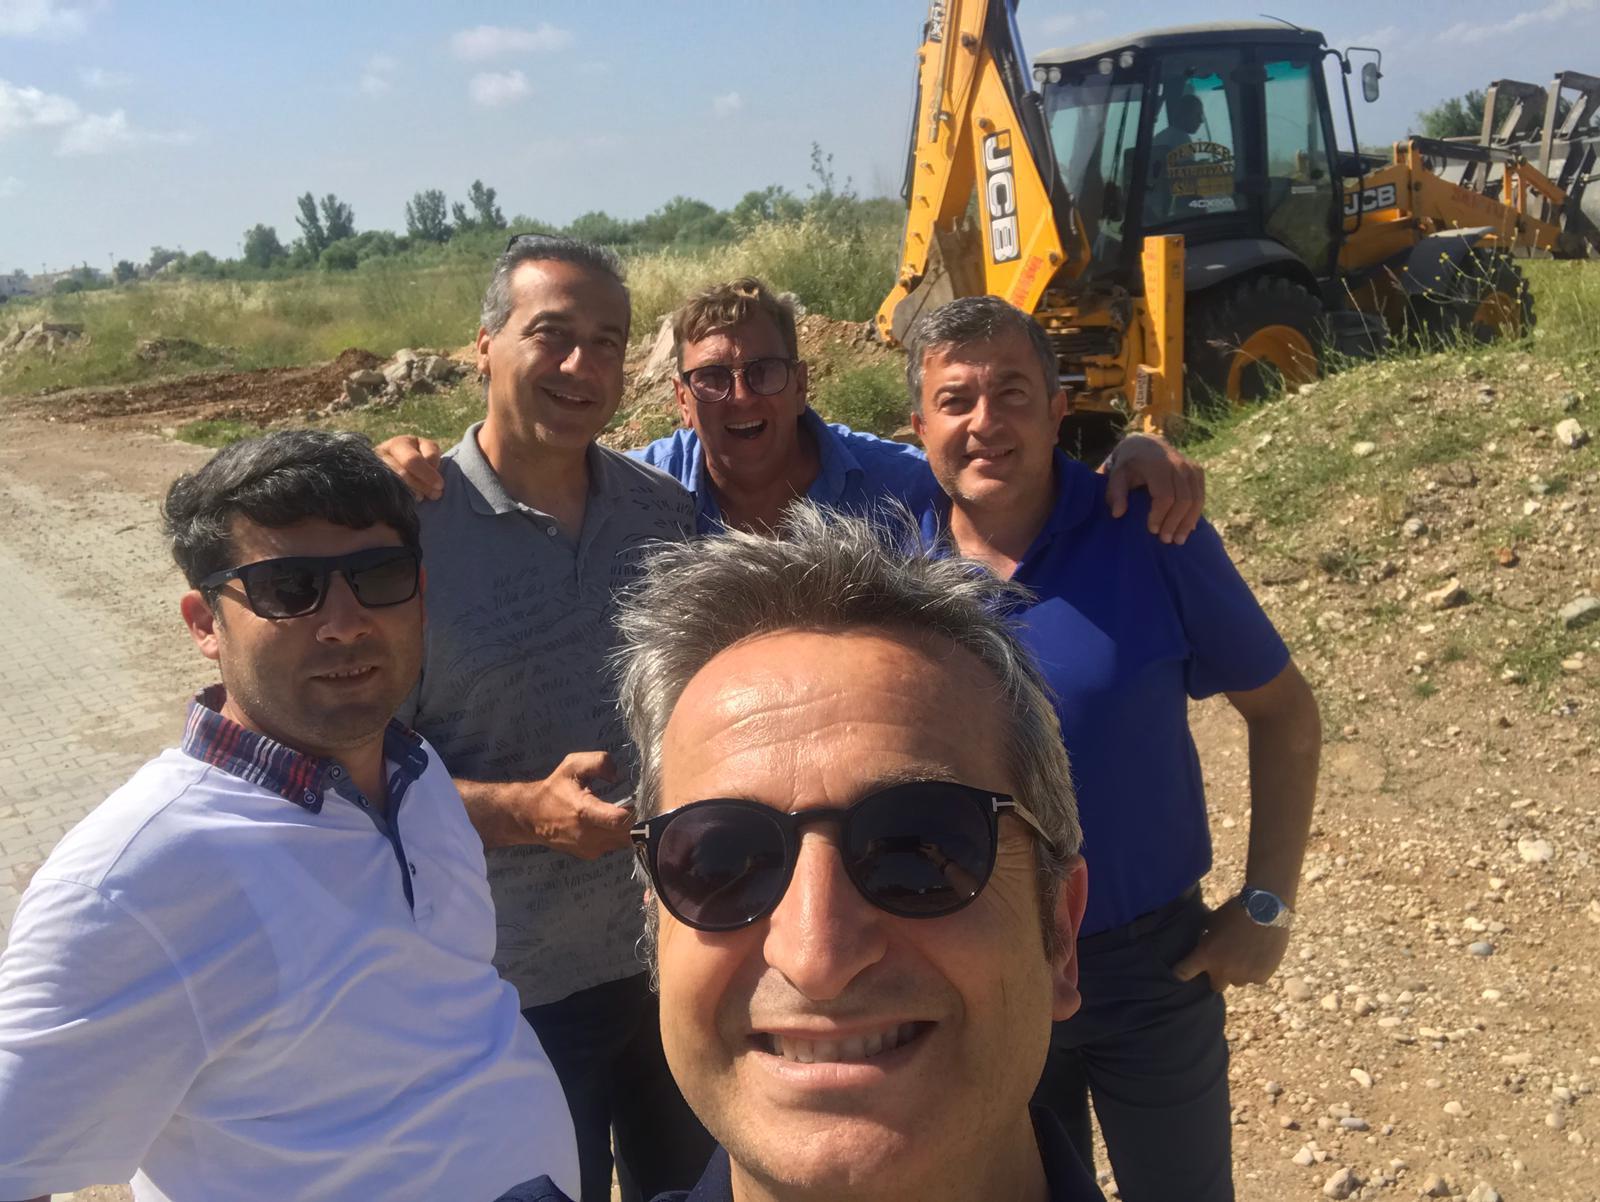 Het team, aangevuld met  Yakup, bemiddelaar met de gemeente Belek